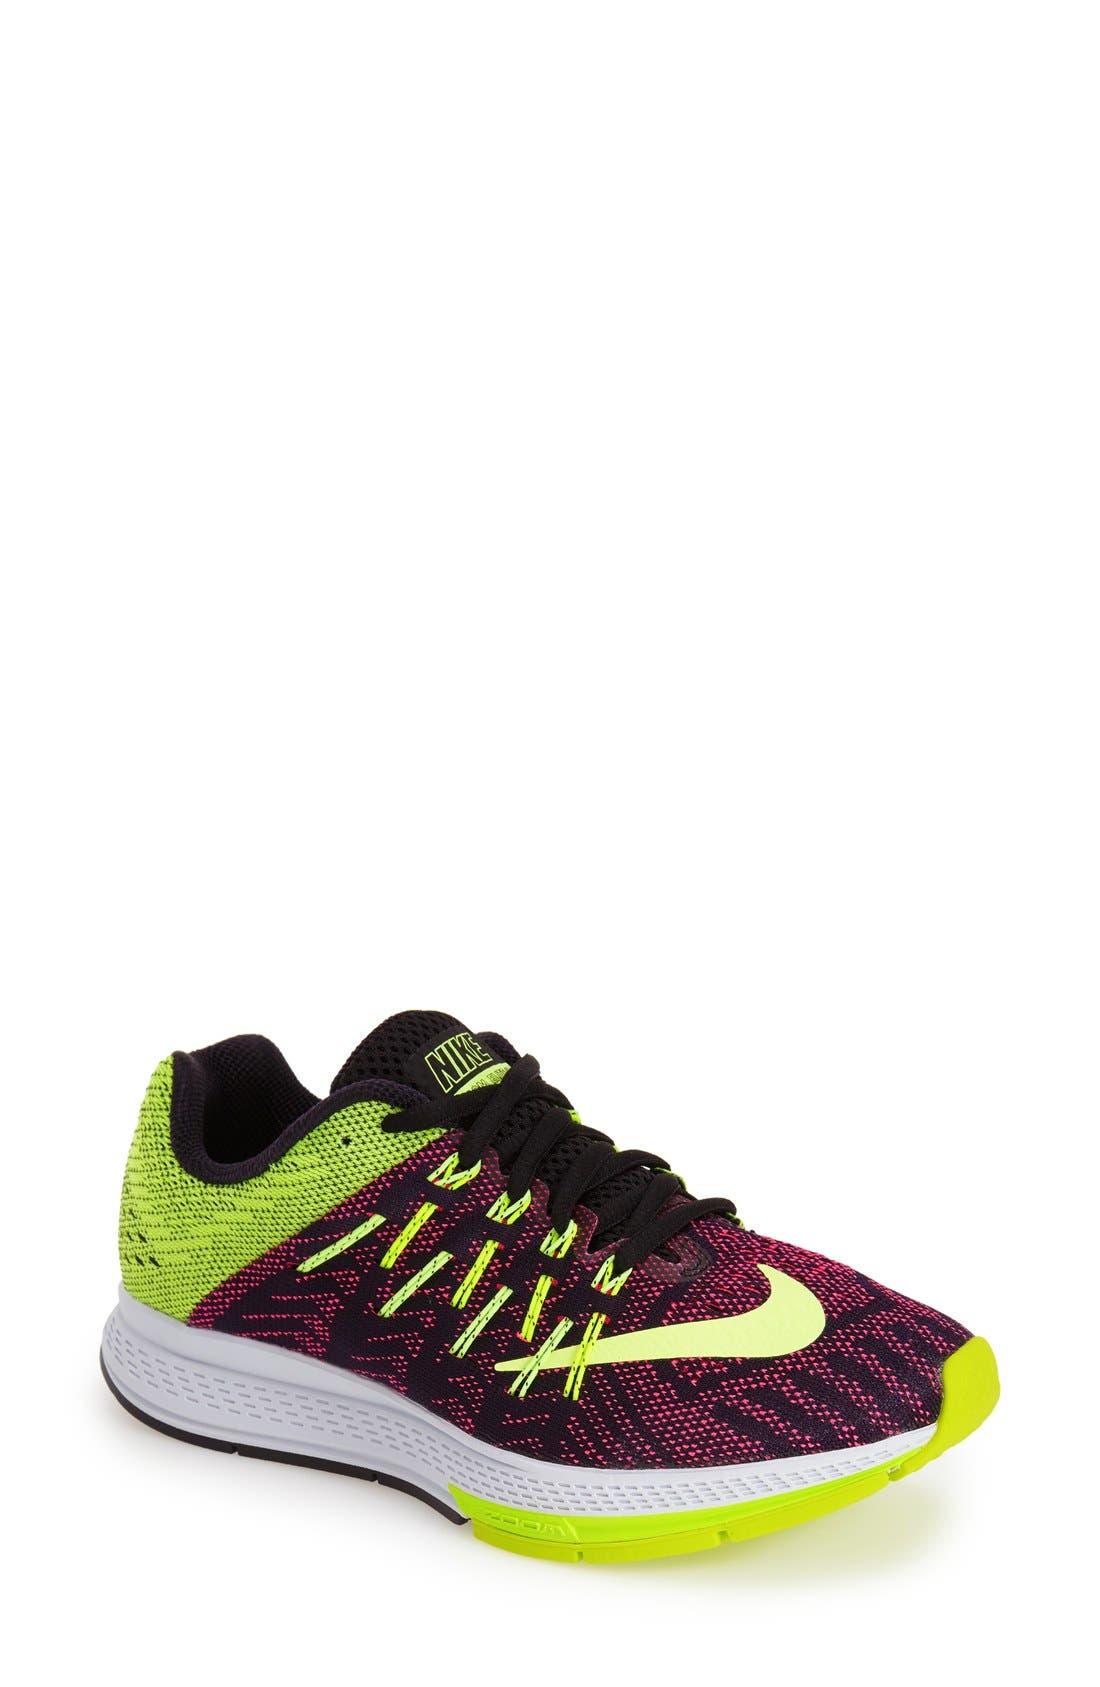 Main Image - Nike 'Air Zoom Elite 8' Running Shoe (Women)